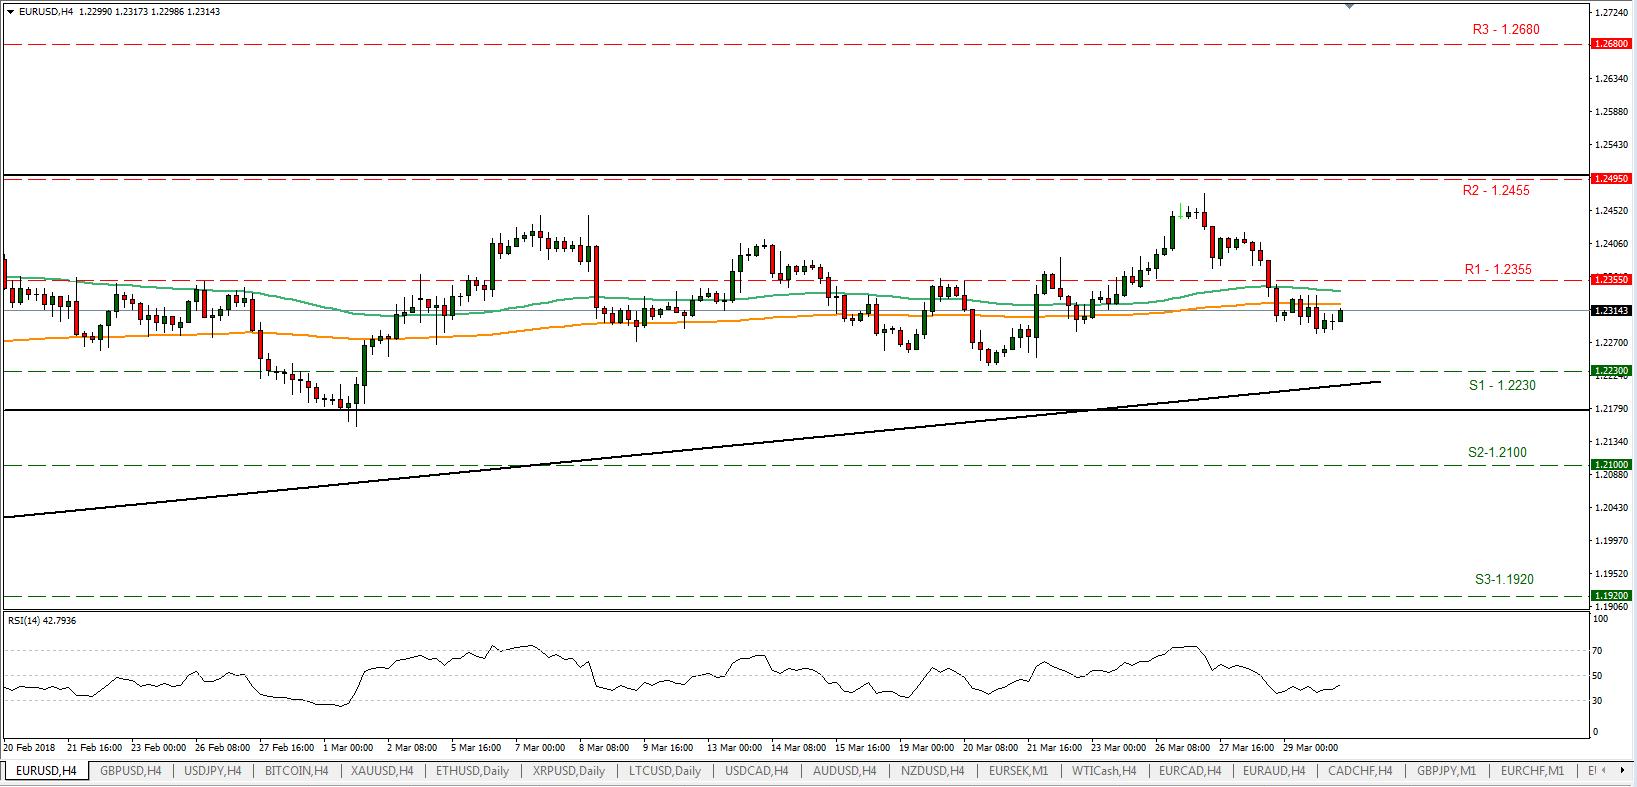 EUR/USD 30/03/2018 | EconAlerts